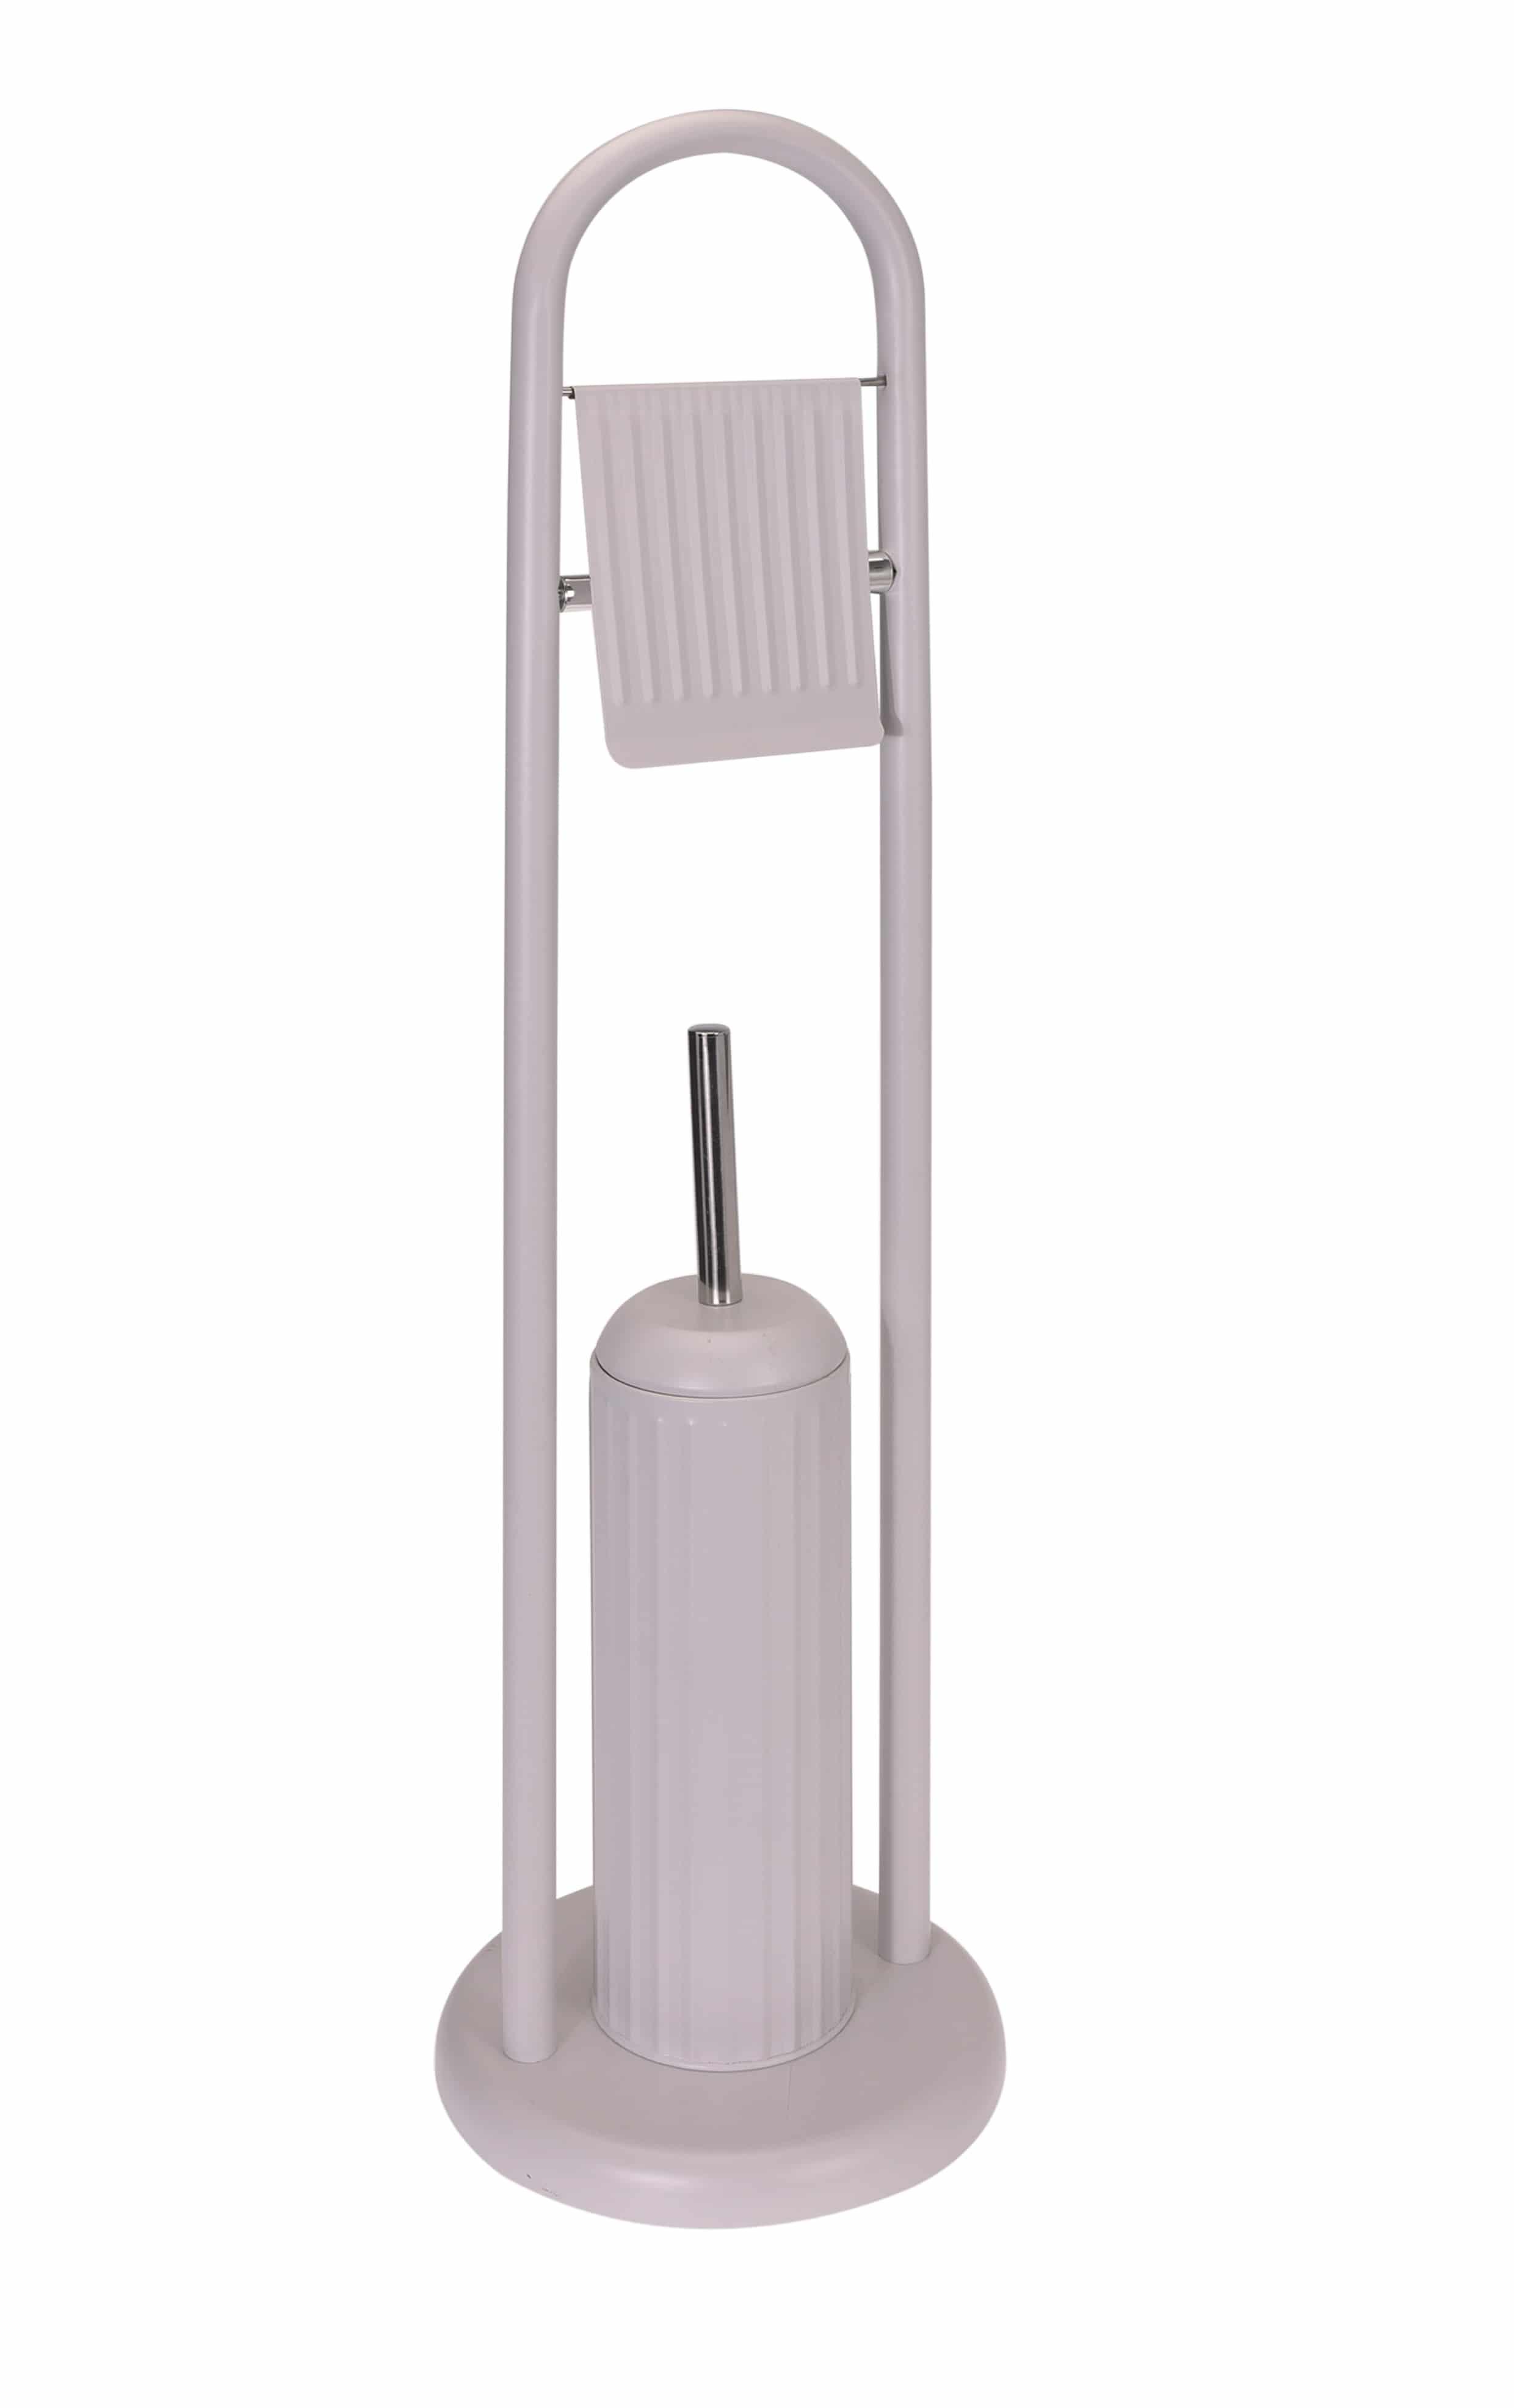 4goodz vrijstaand toiletgarnituur - 79 cm hoog - Taupe